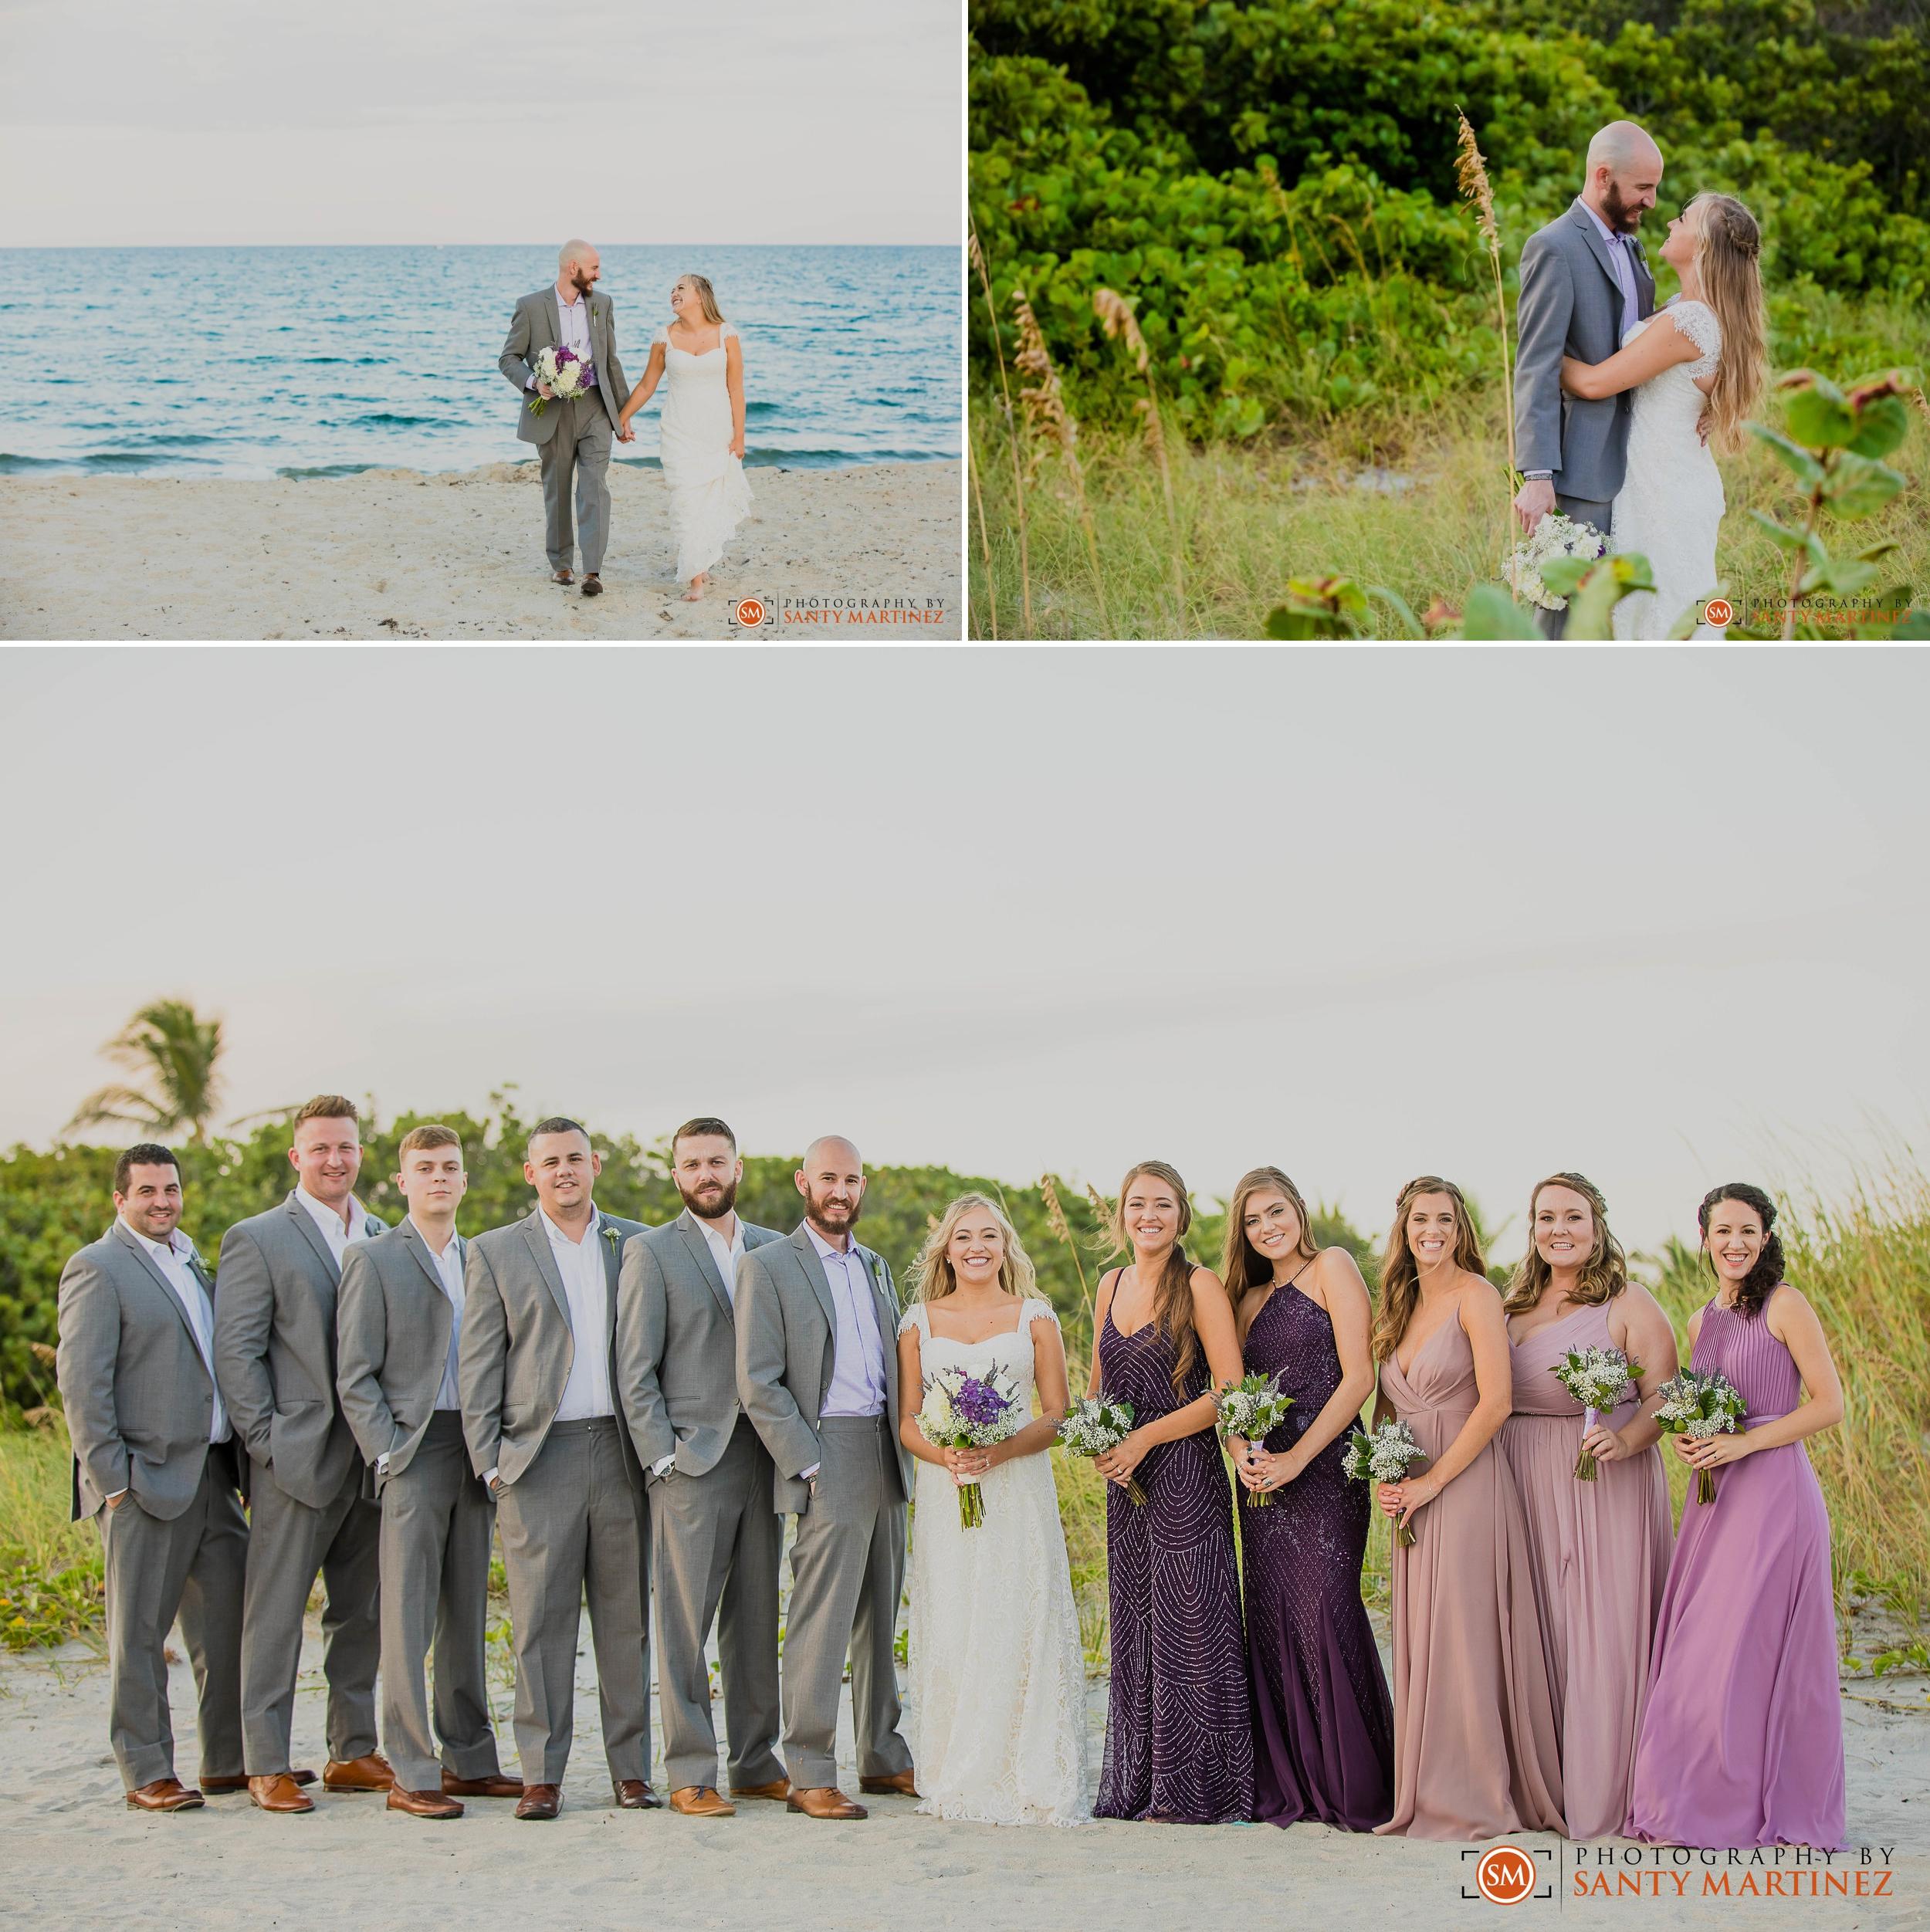 Wedding - Seagate Beach Club - Hotel - Delray Beach - Santy Martinez Photography 7.jpg